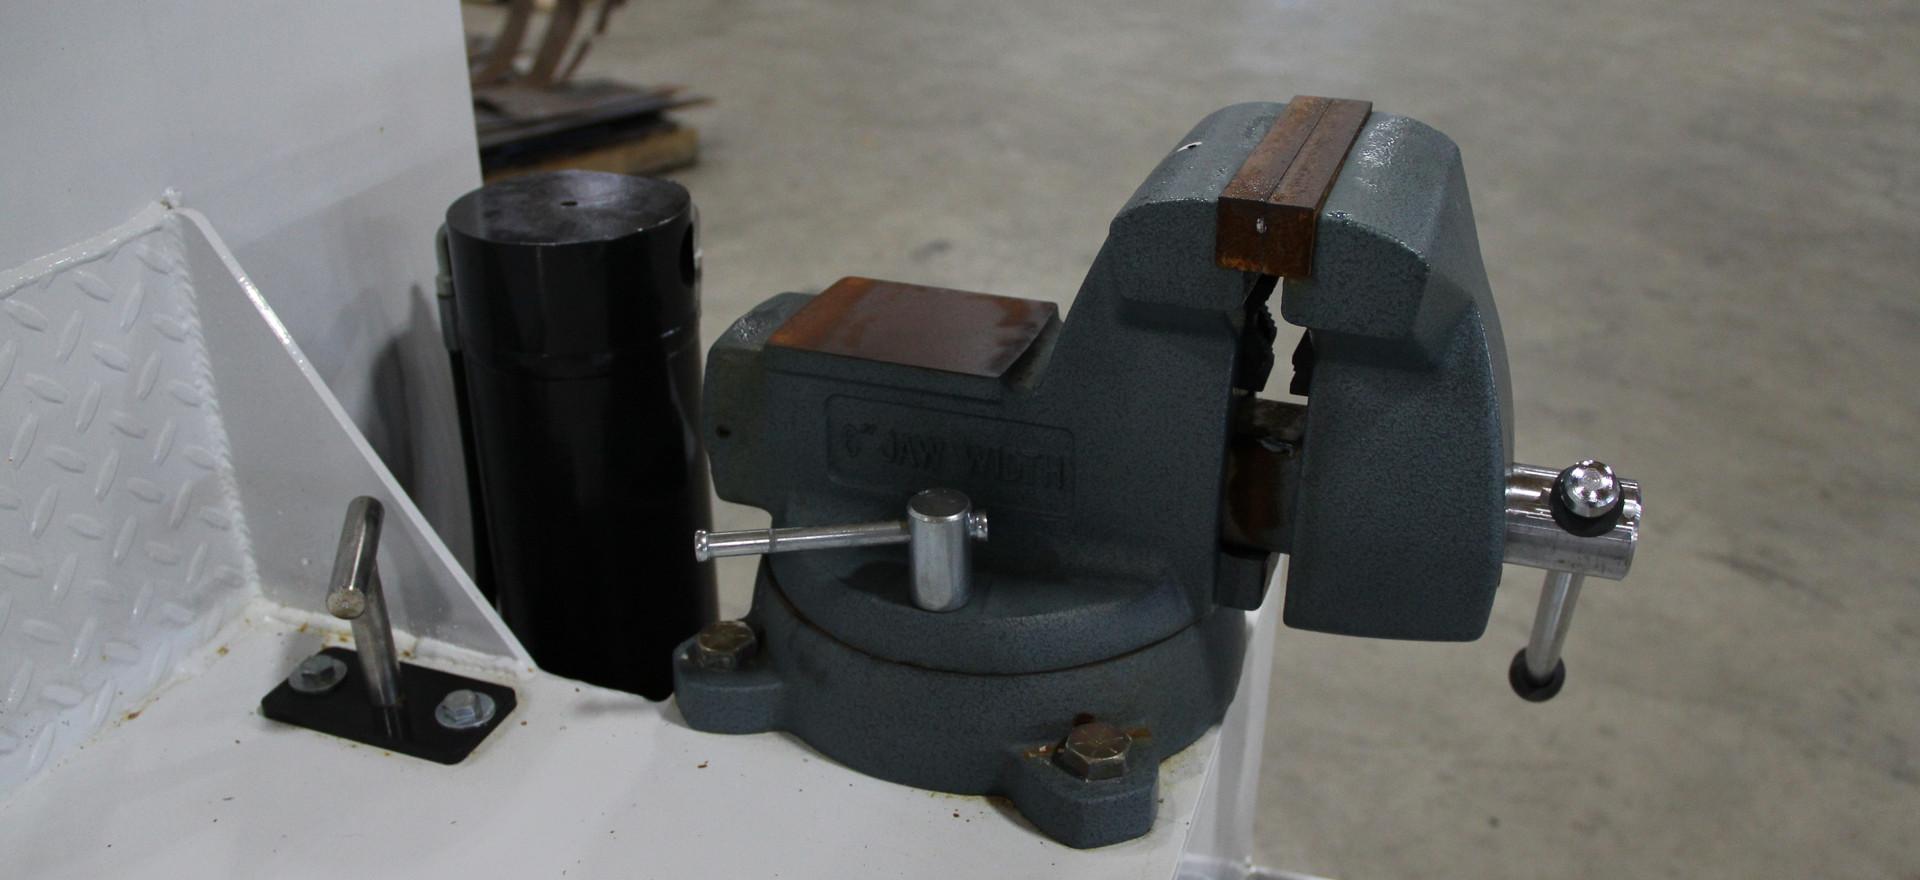 vise mount on service body.JPG